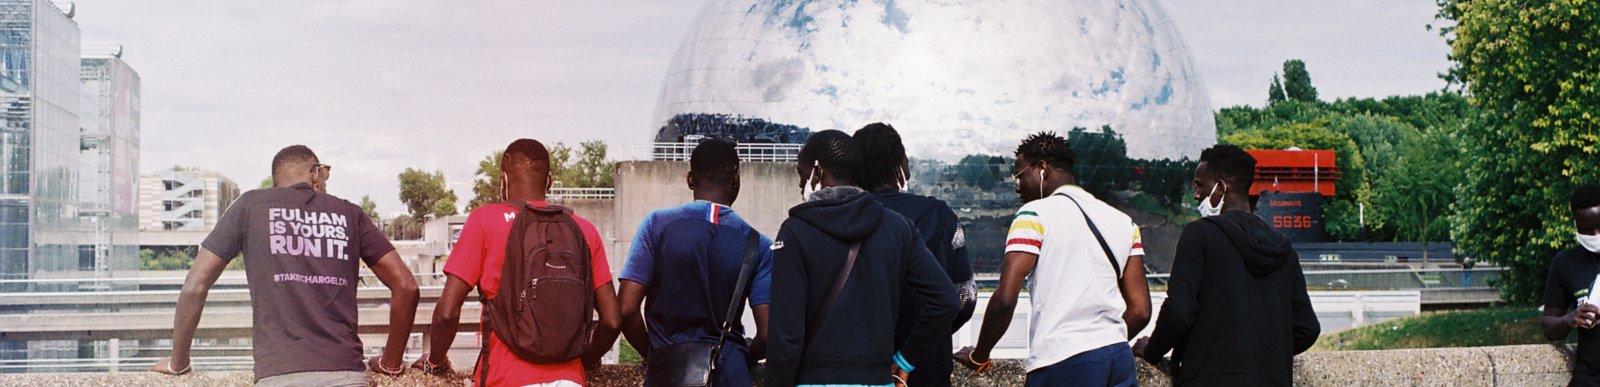 Unaccompanied minors in Paris - 2020